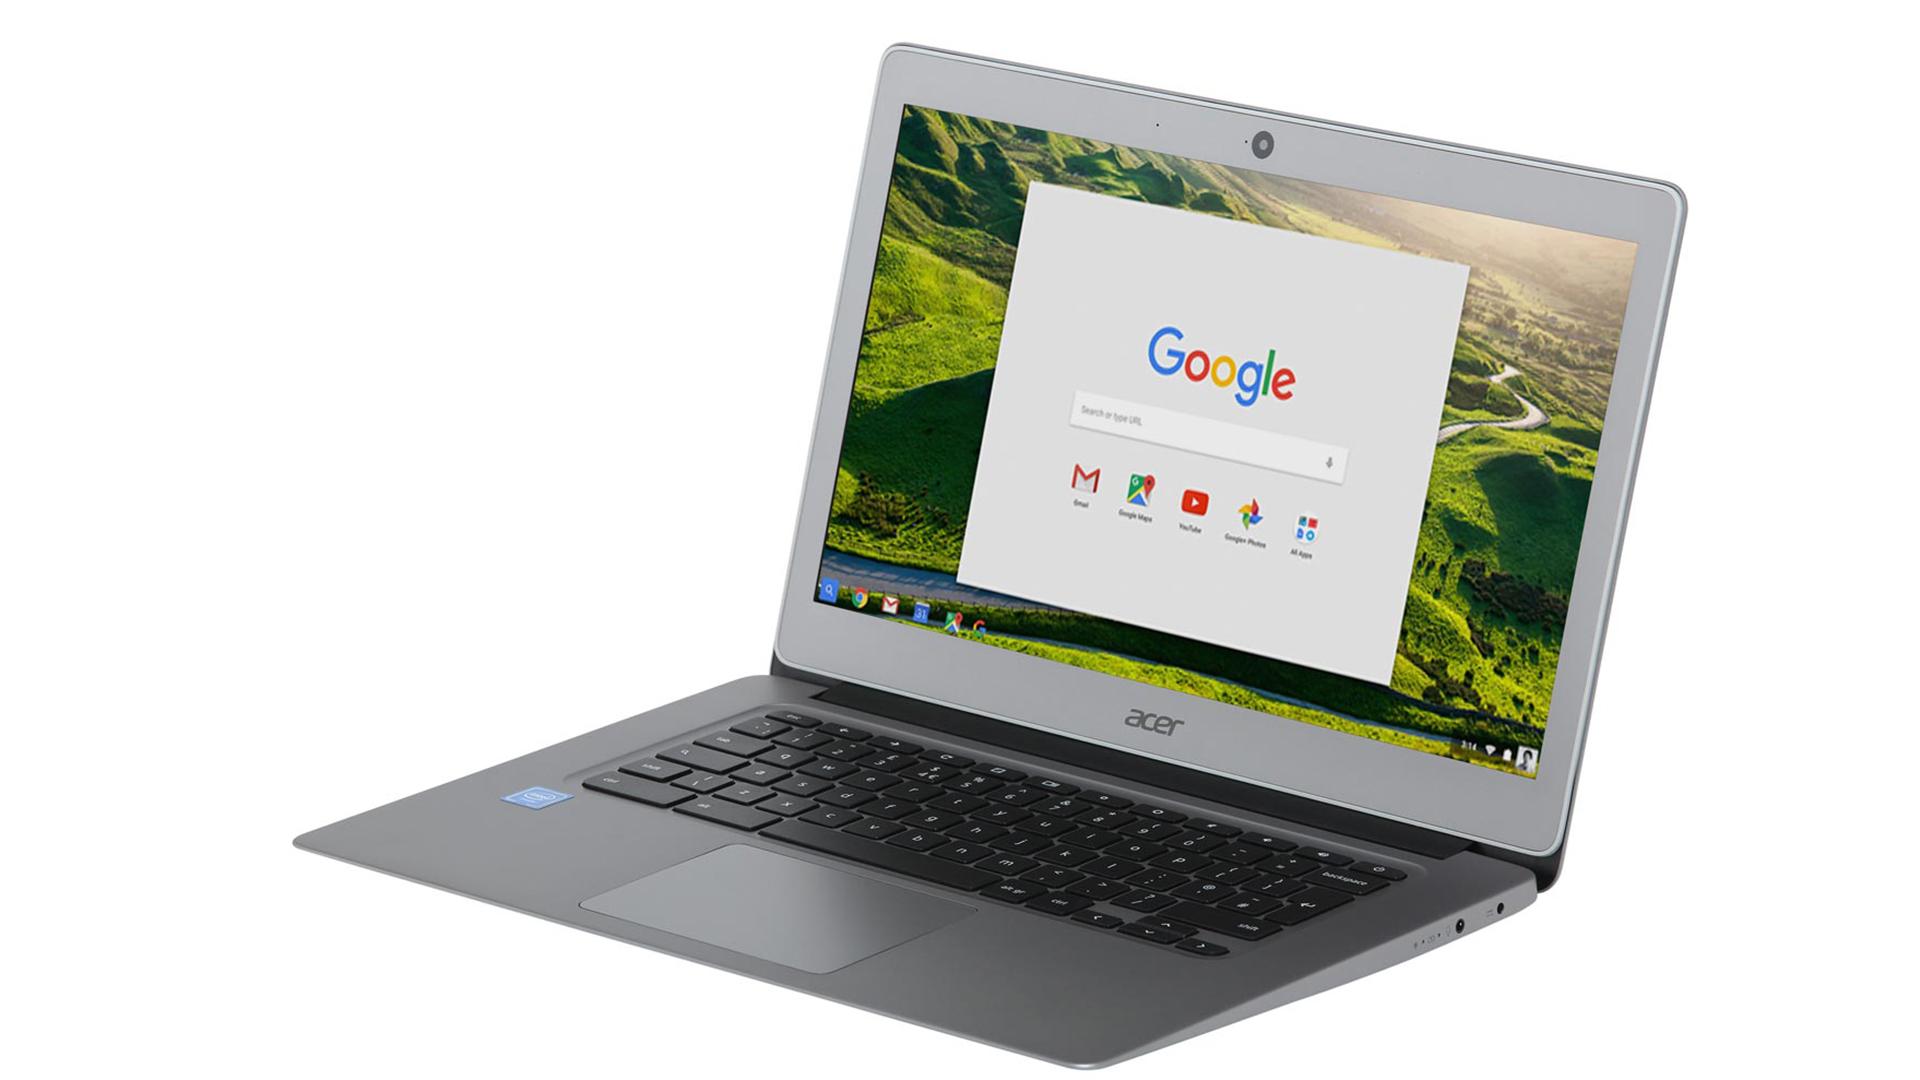 Finding perfect Chromebook QbouPrBVkf9GmtmxFsuL